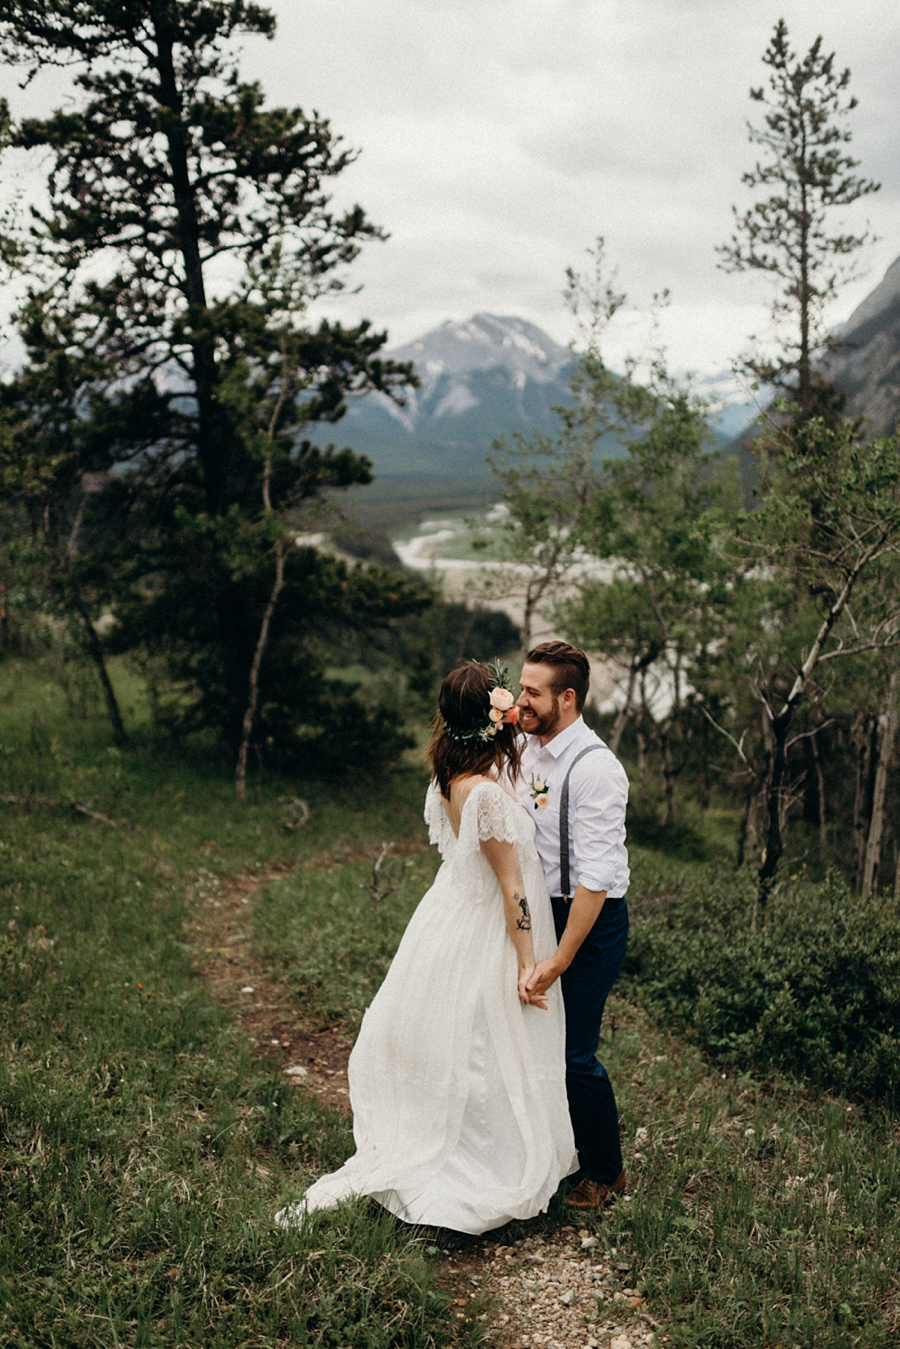 kaihla_tonai_intimate_wedding_elopement_photographer_7237.jpg